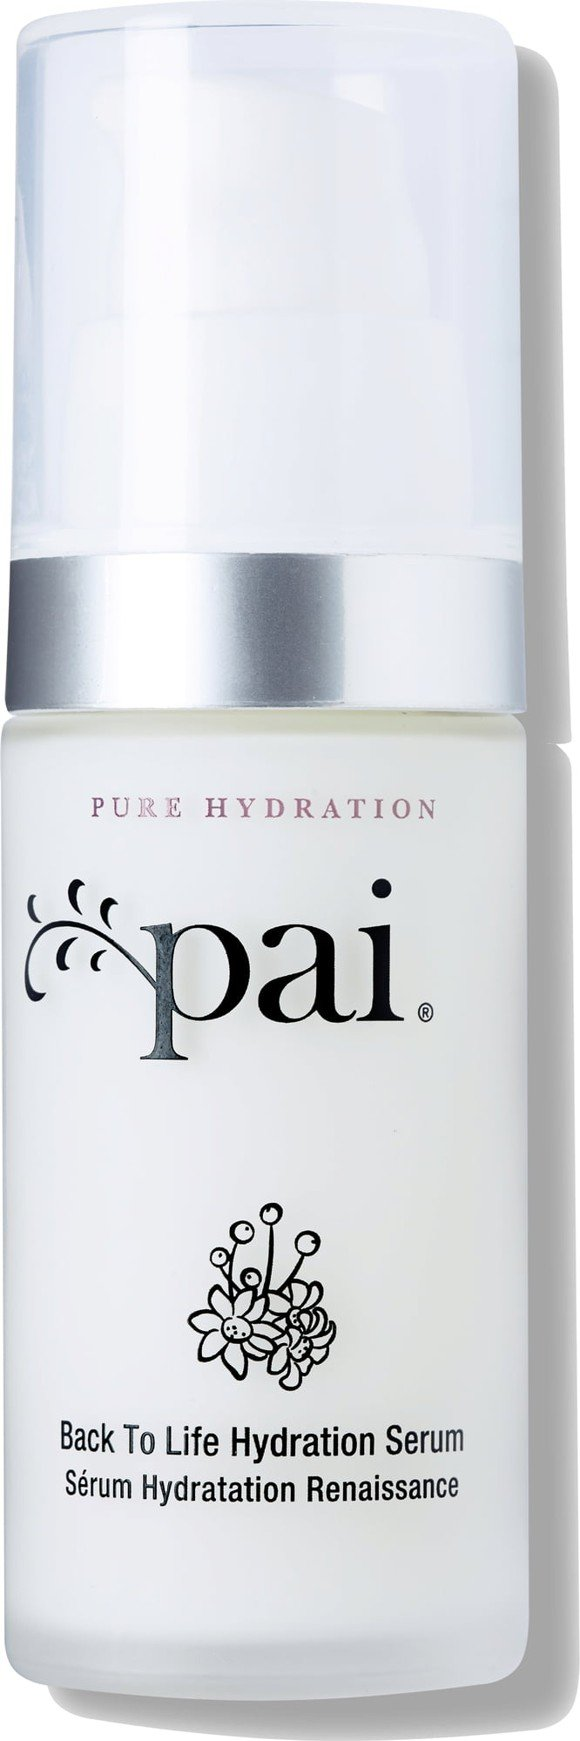 Pai - Back to Life Hydration Serum30 ml